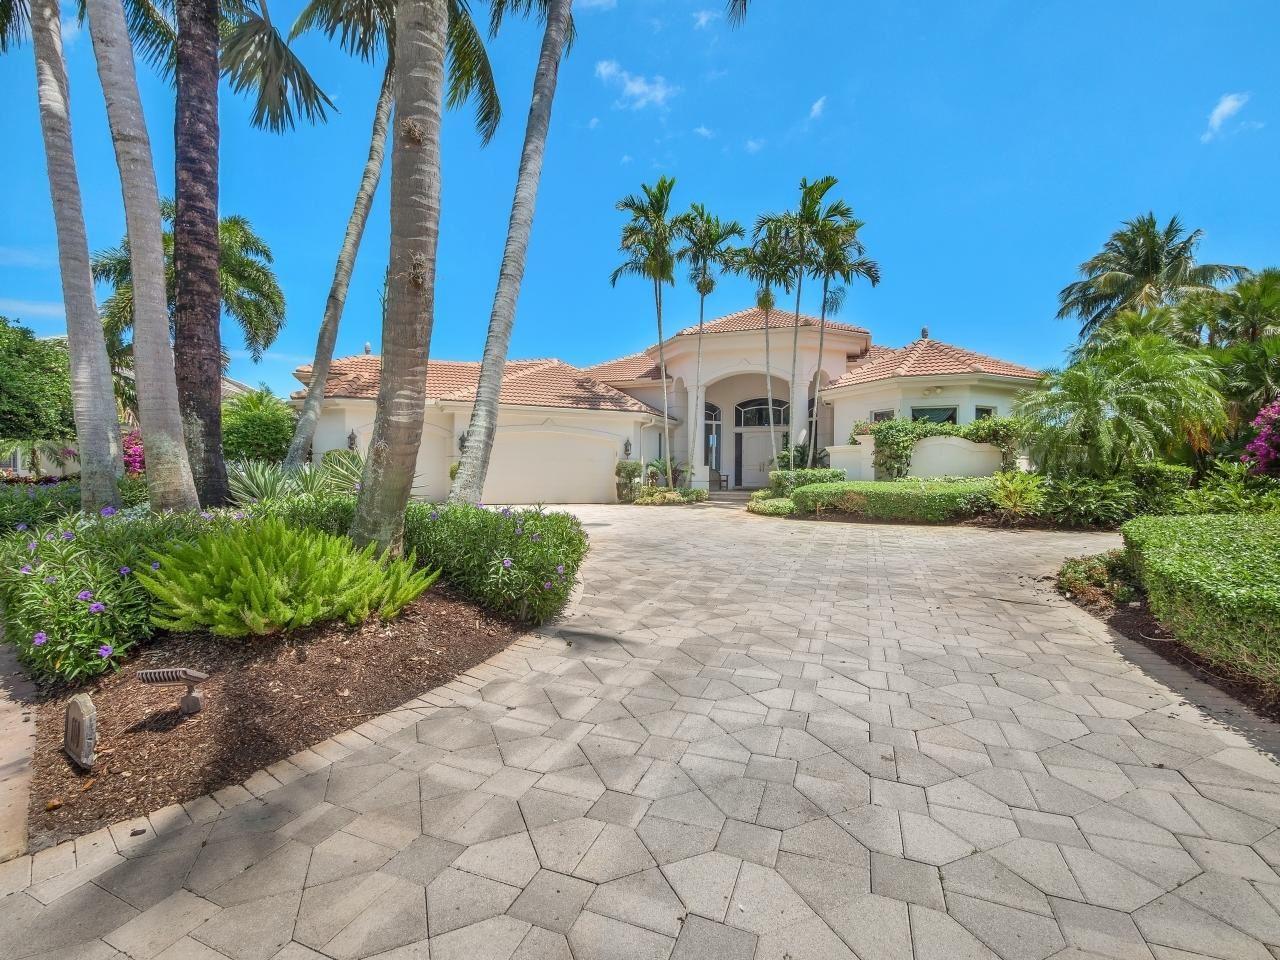 Photo of 110 Saint Edward Place, Palm Beach Gardens, FL 33418 (MLS # RX-10708153)